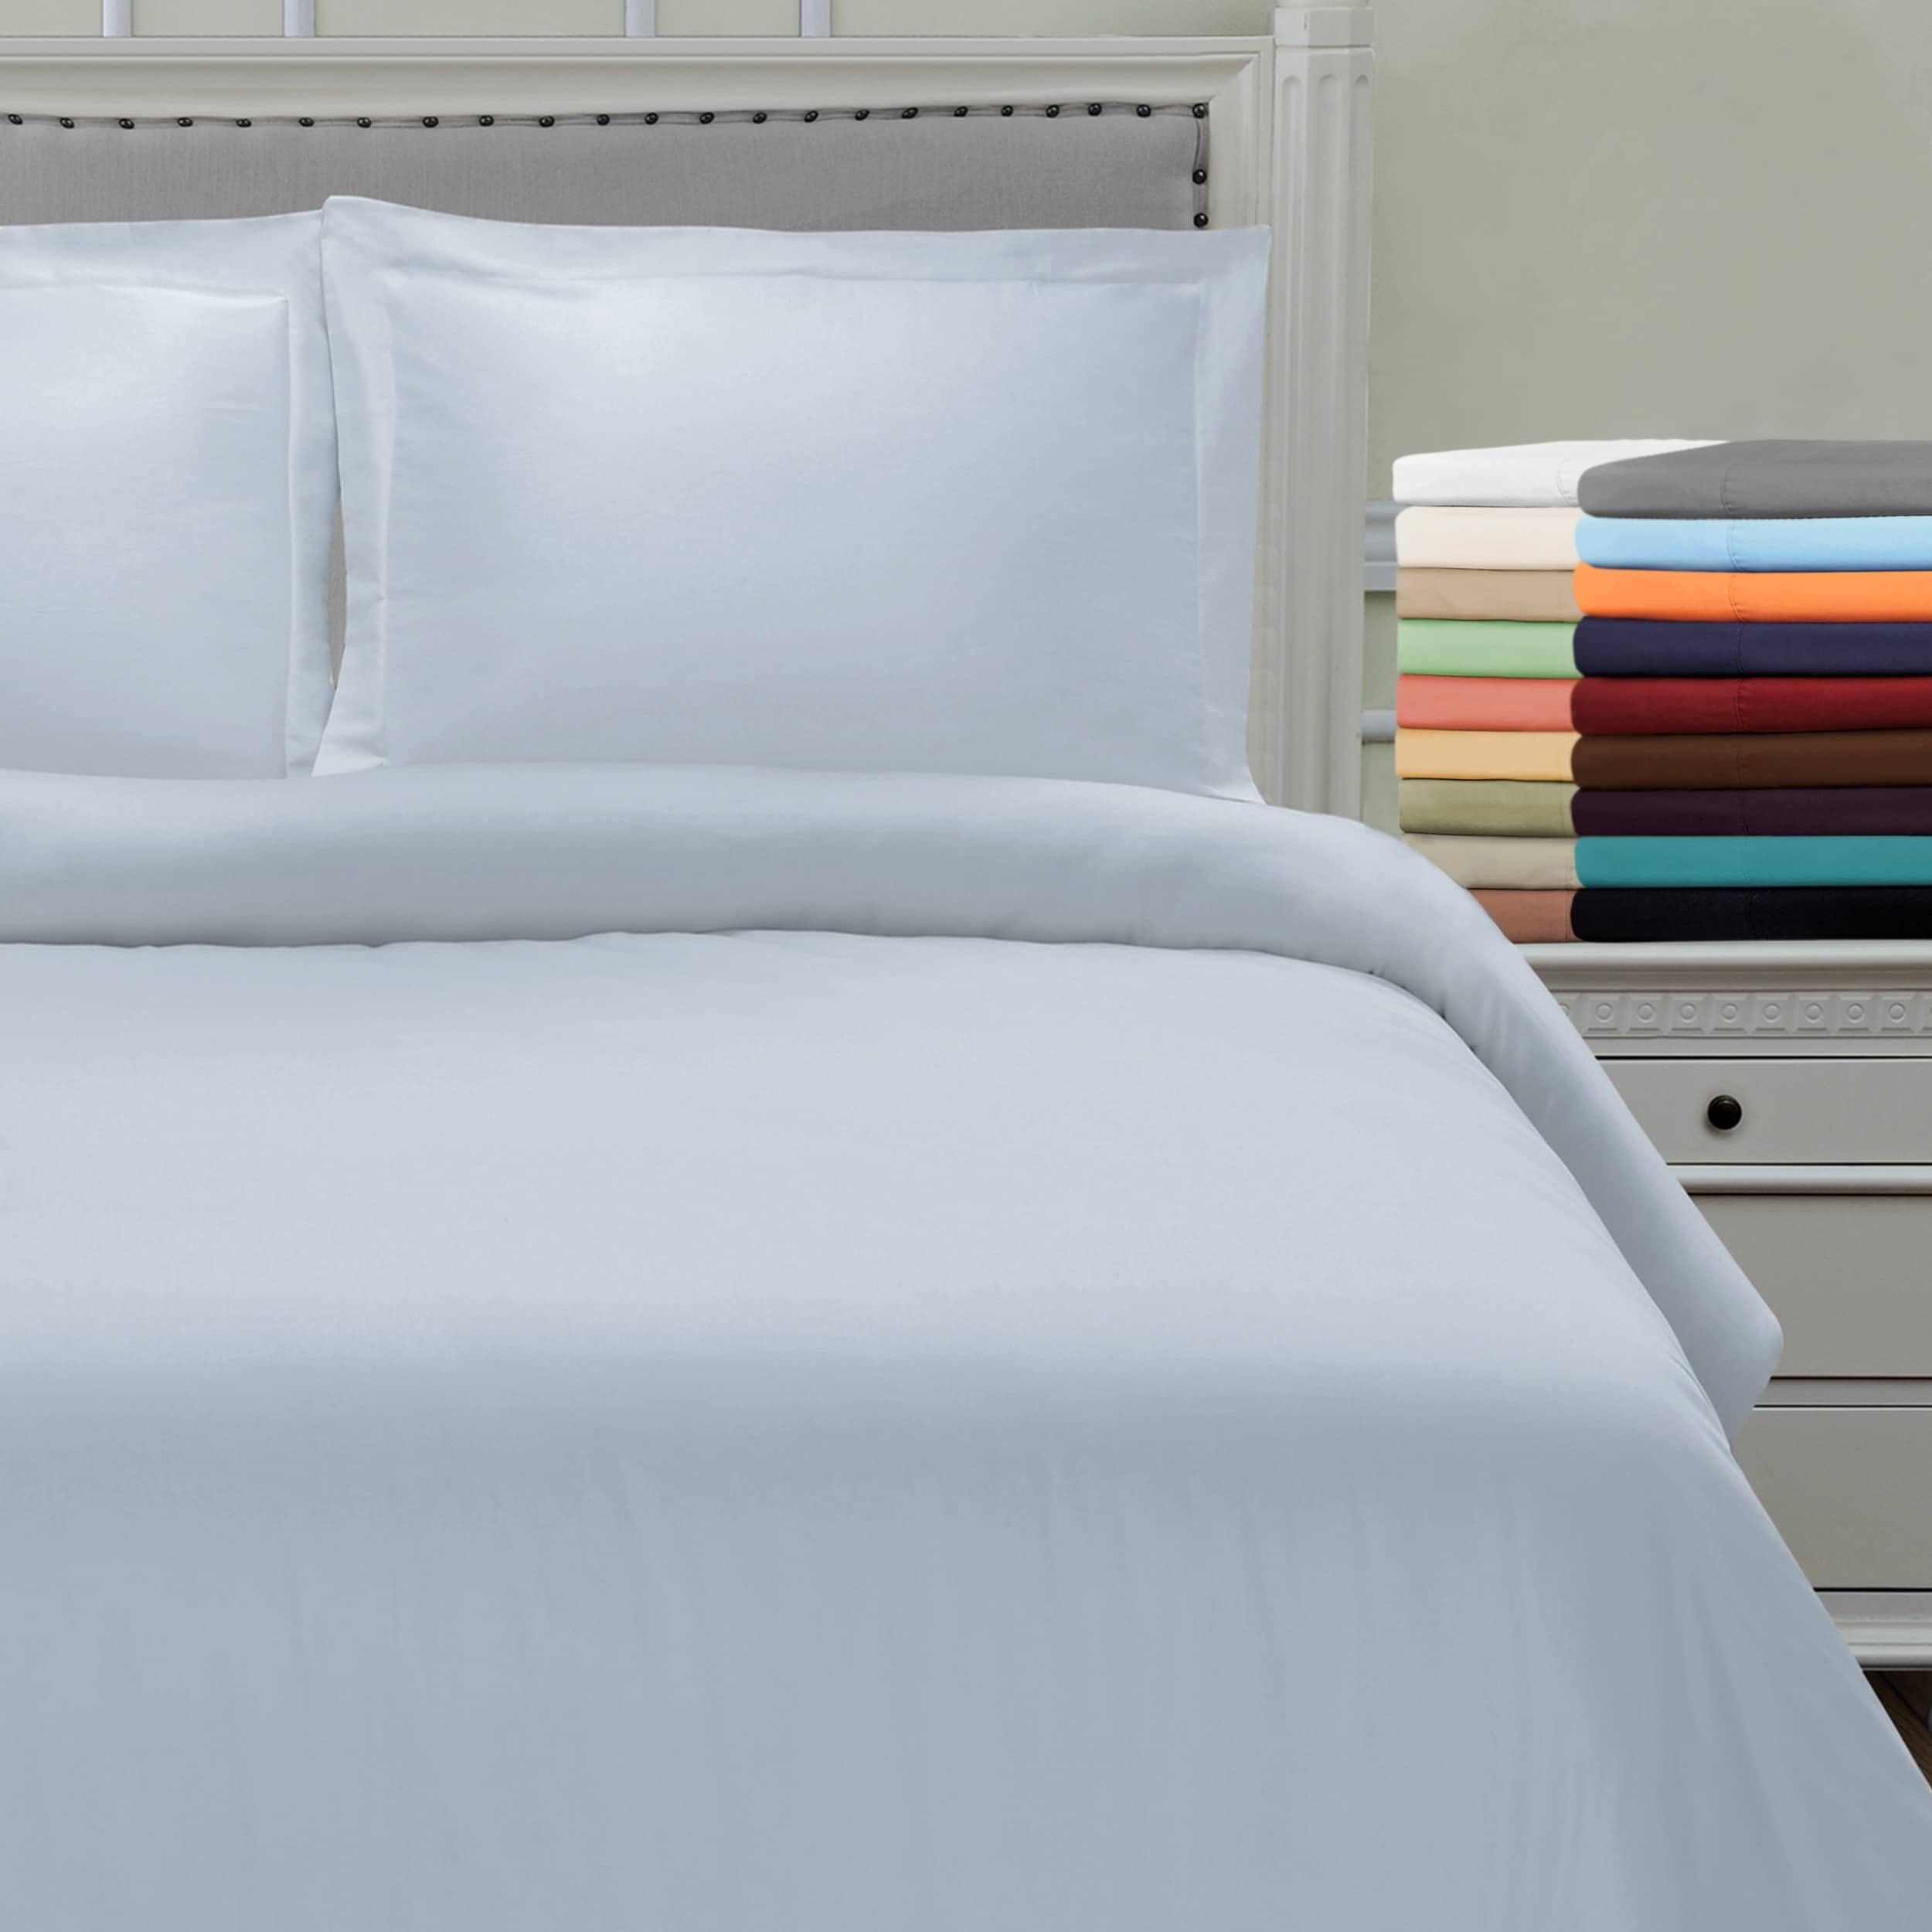 Superior Wrinkle Resistant Brushed Microfiber Duvet Cover Set Free Shipping On Orders Over 45 14695181